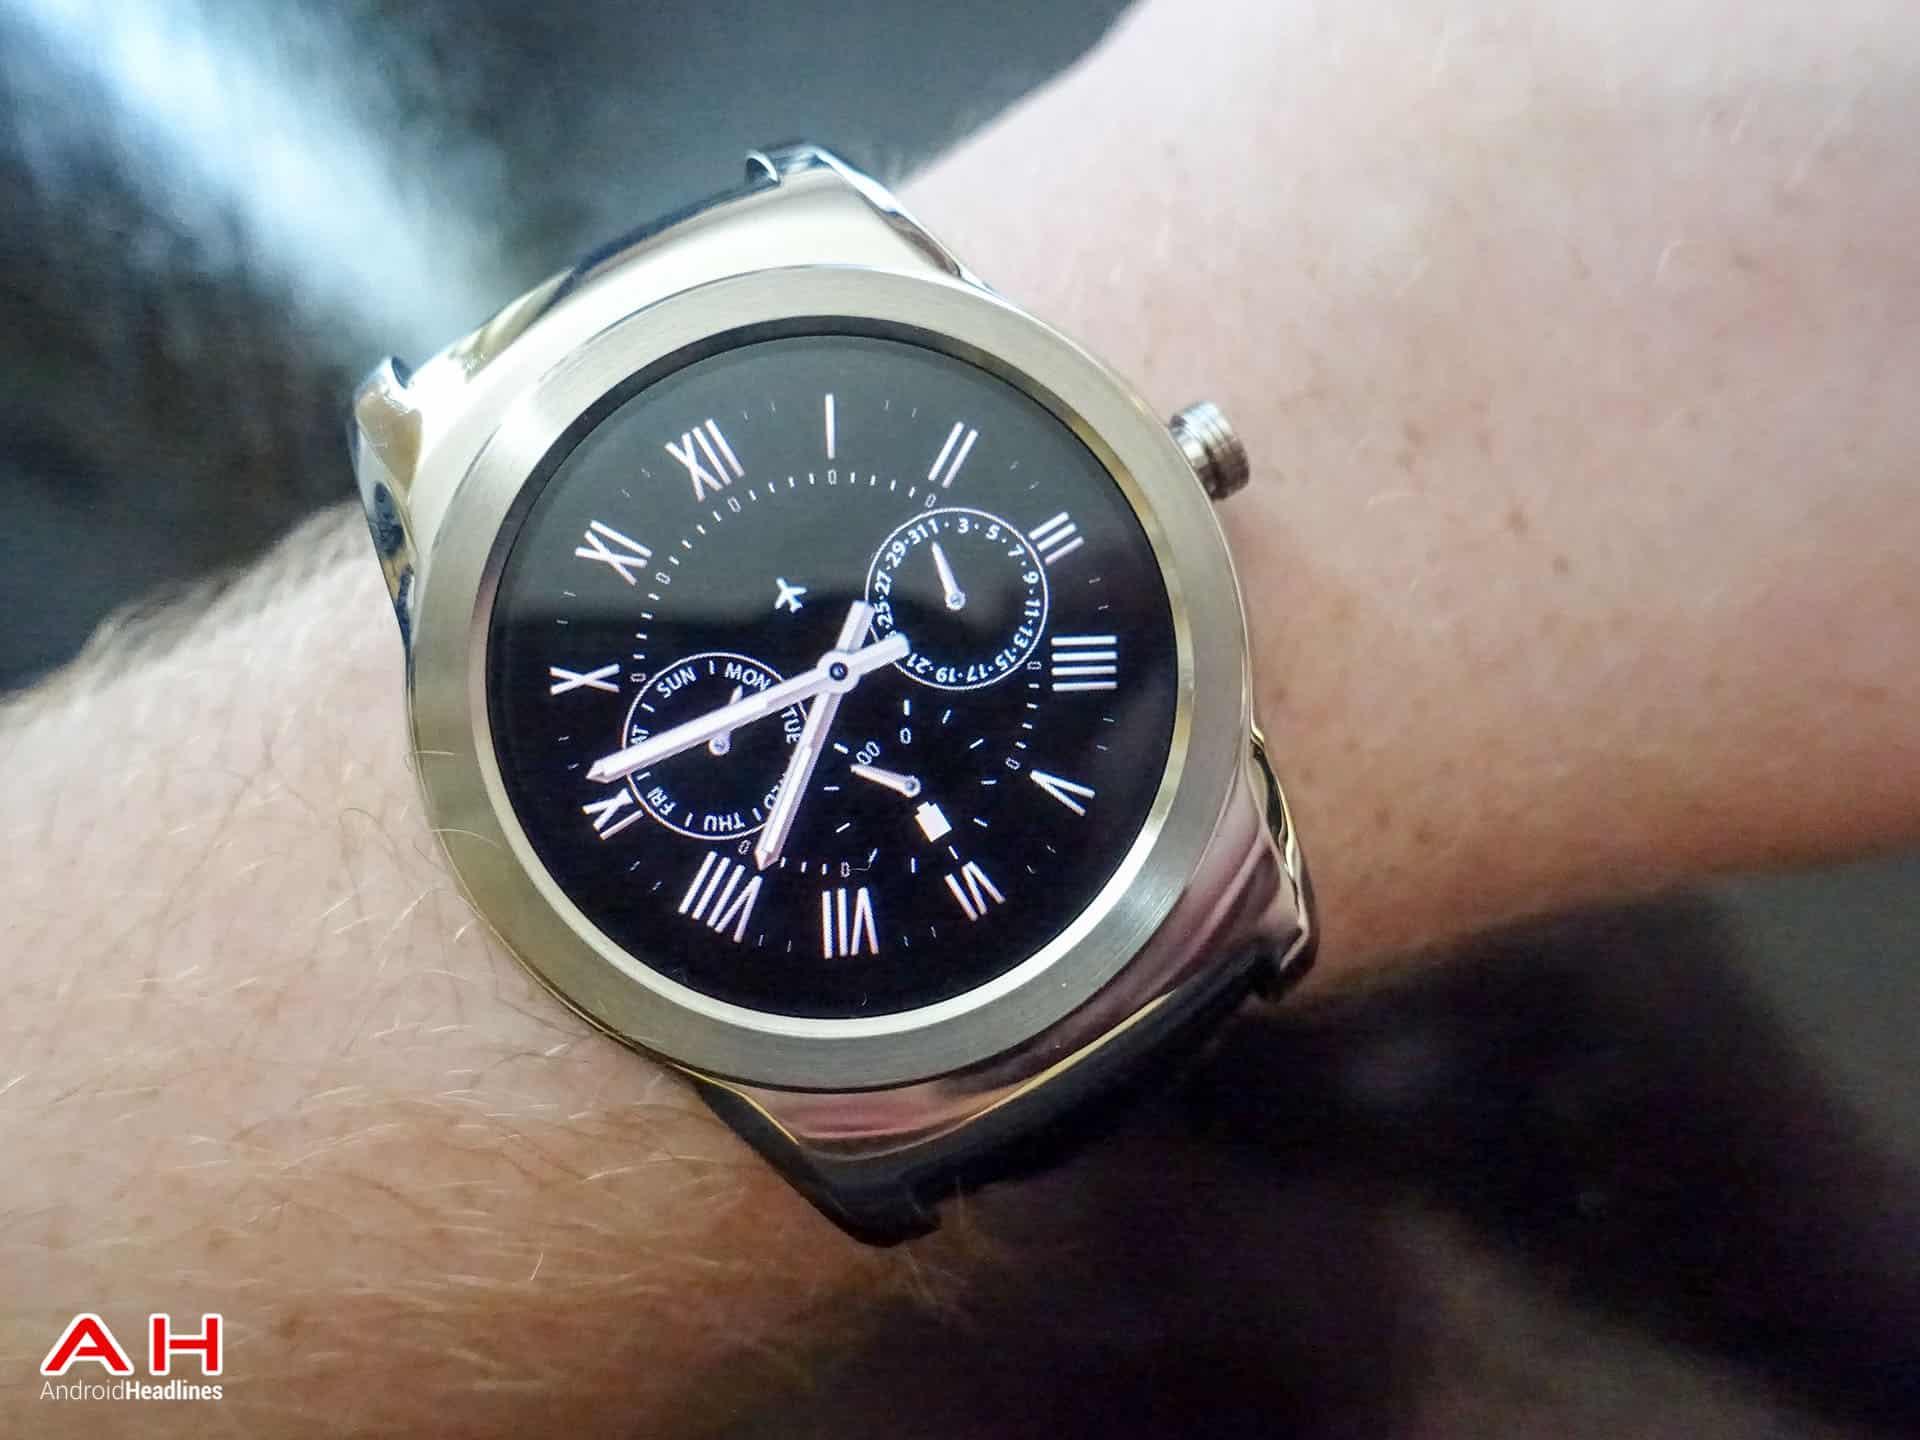 LG-Watch-Urbane-Review-AH-13